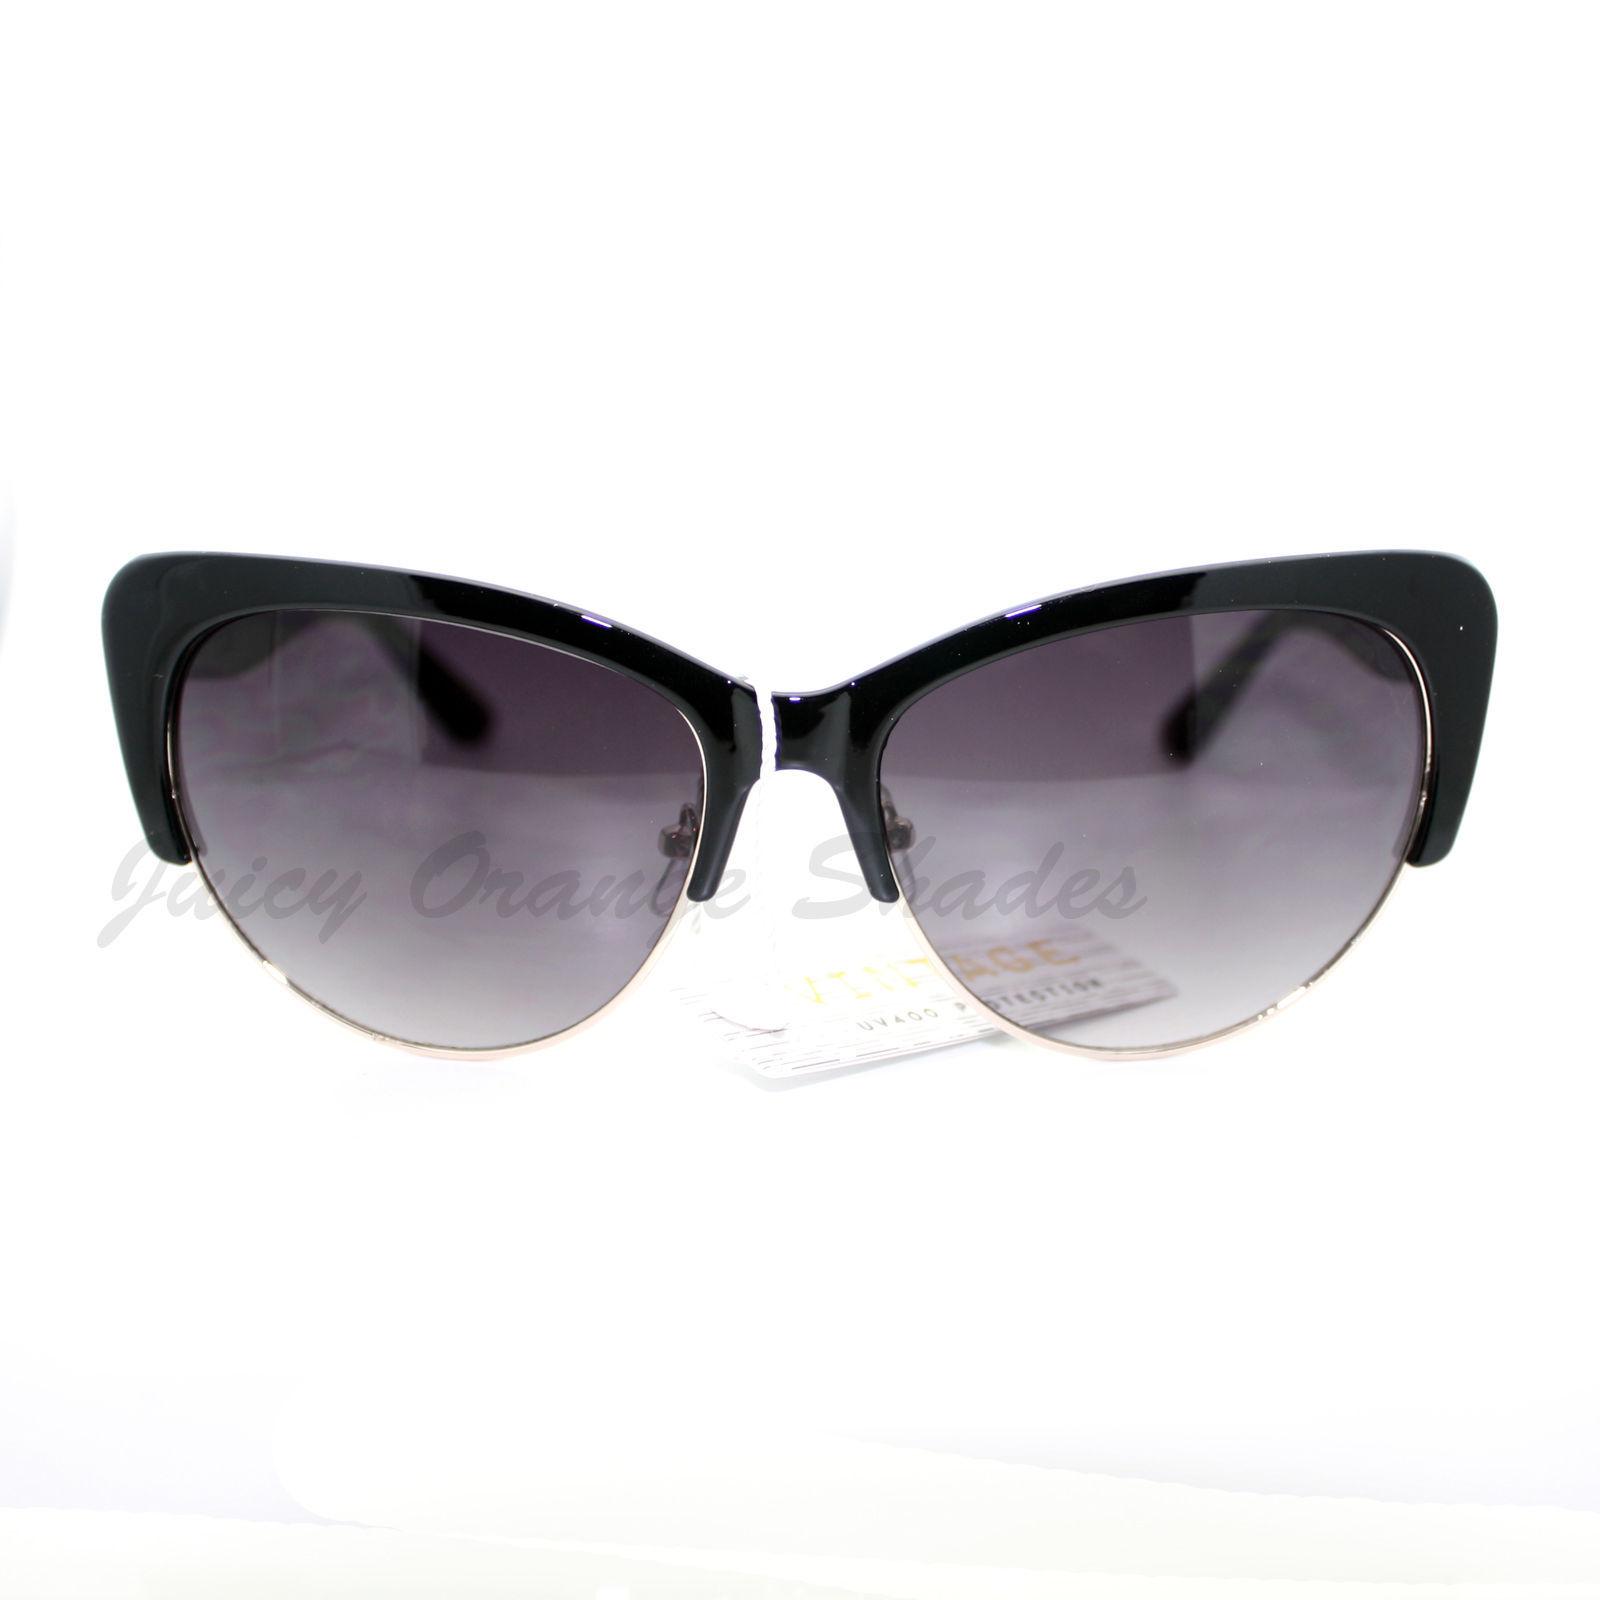 Womens Fashion Sunglasses Retro Plastic Top Oval Cateye Frame